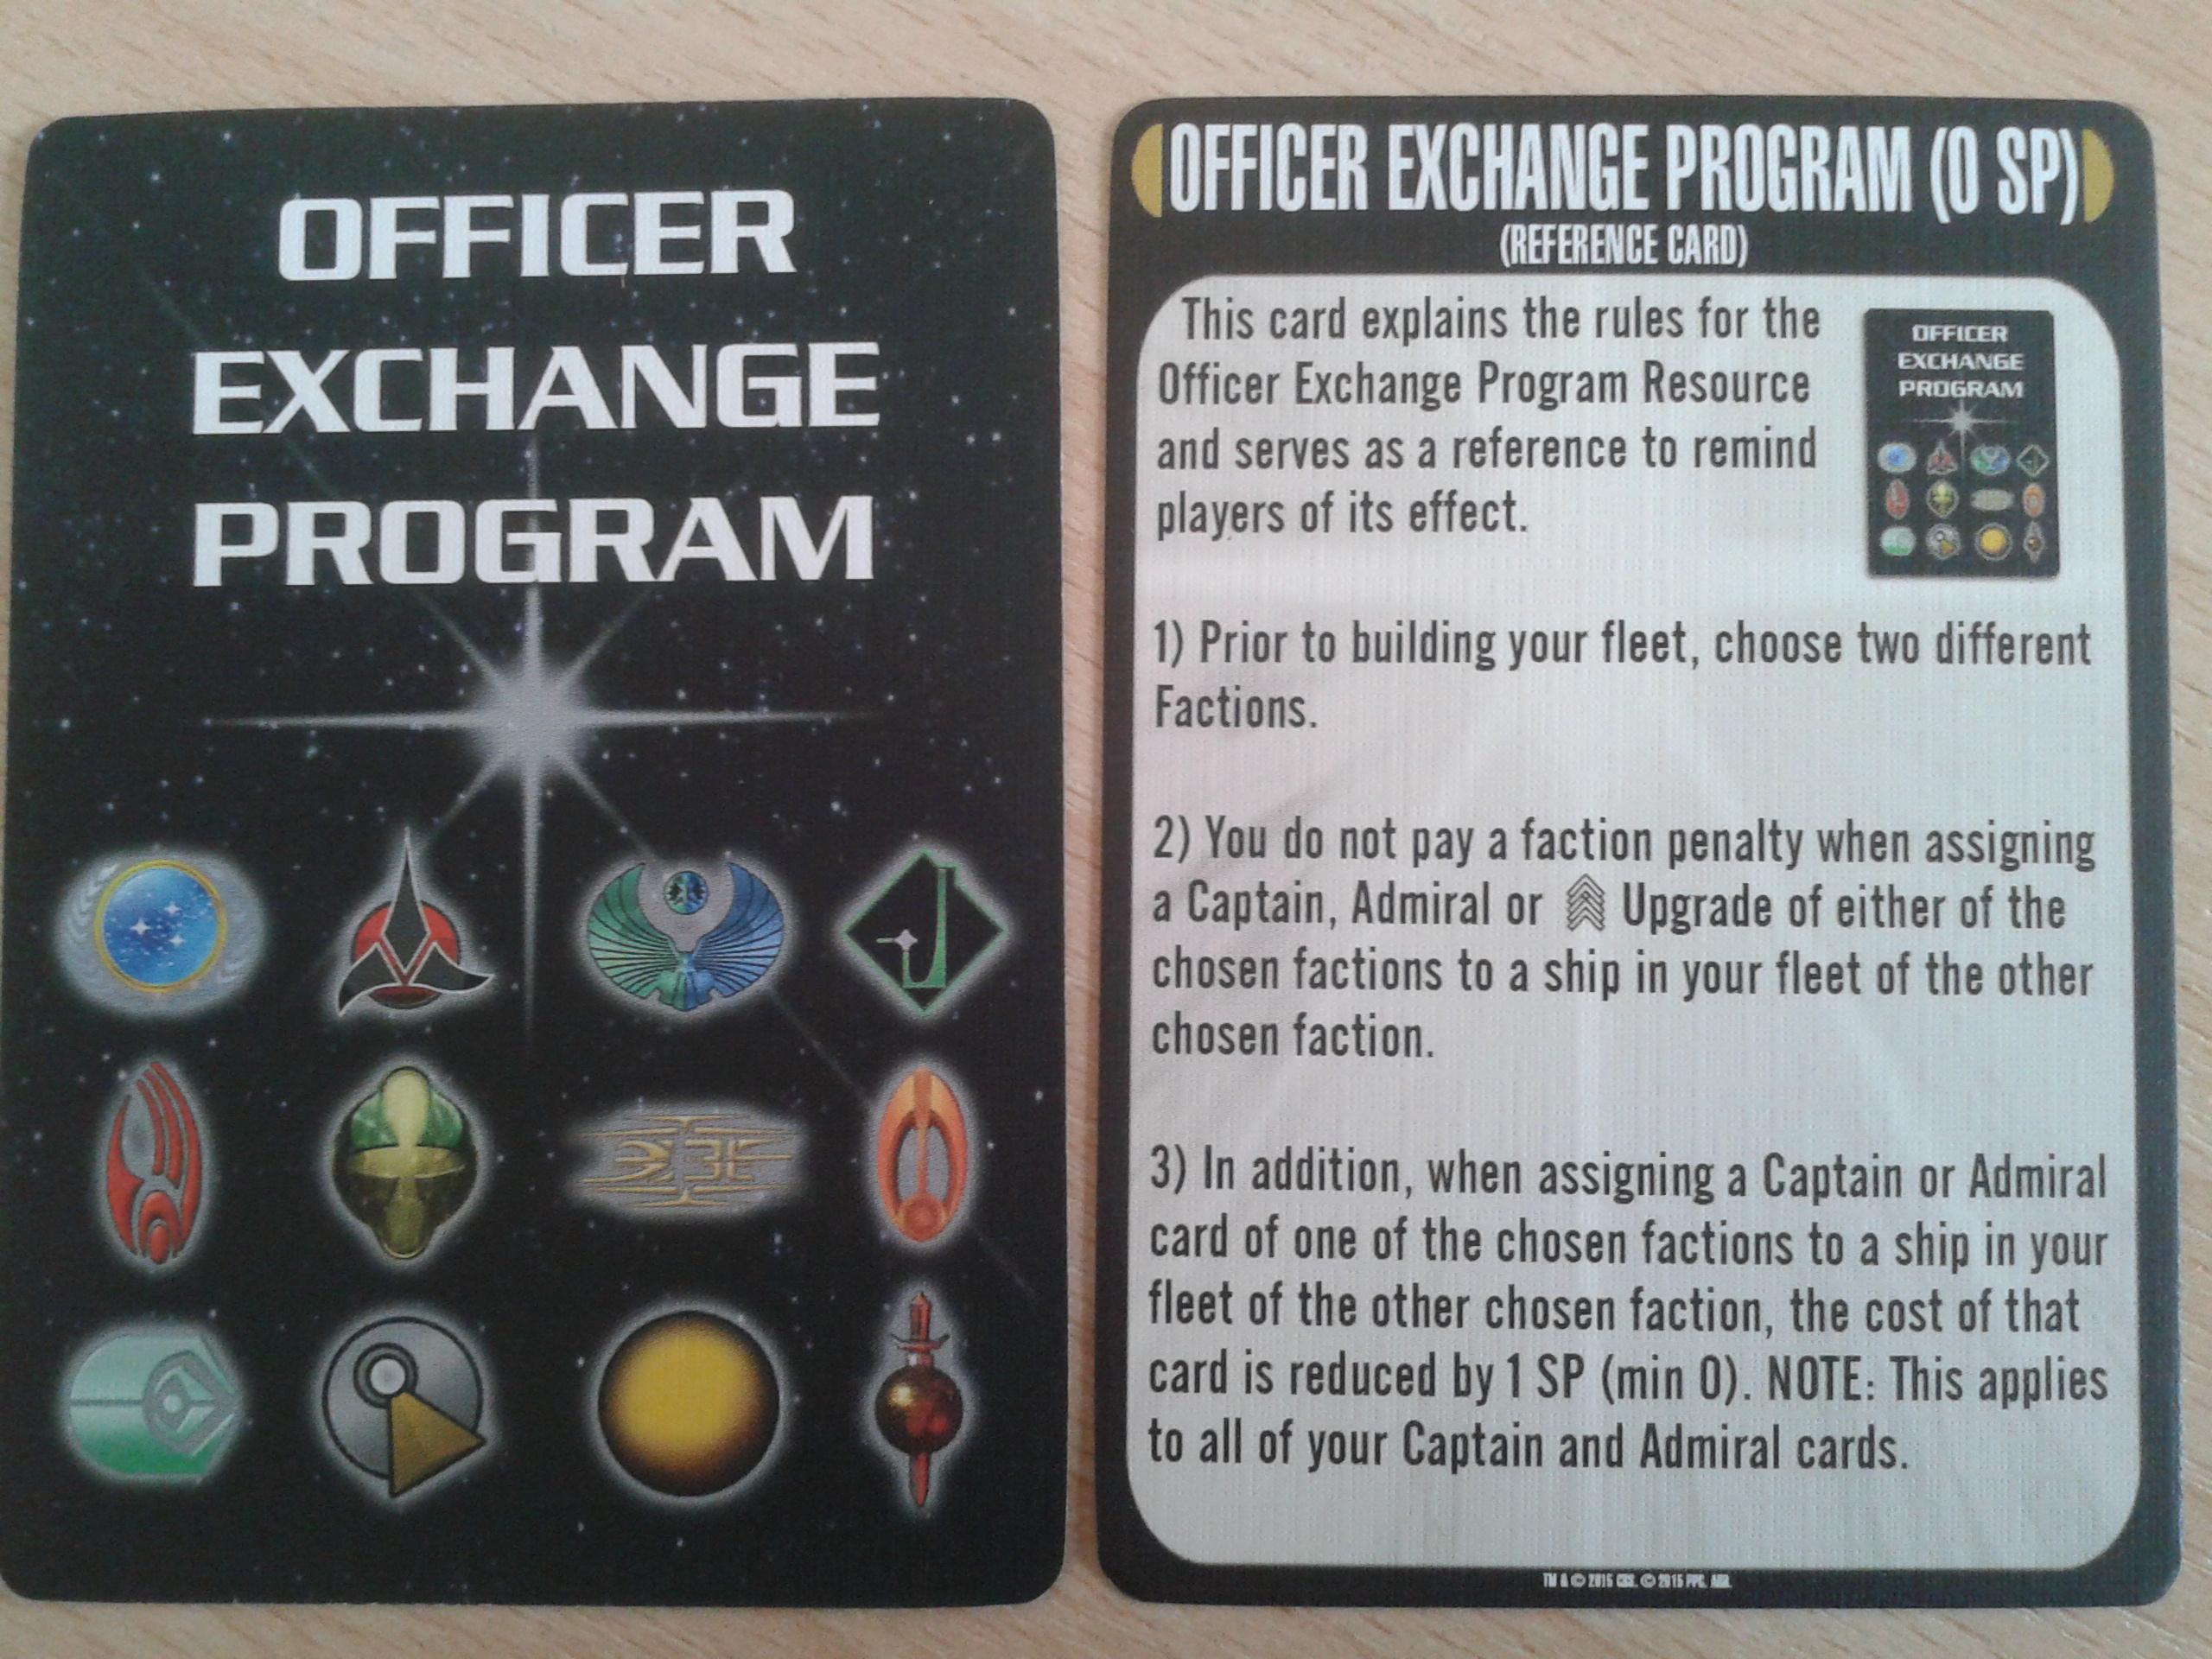 [Biete] Officer Exchange Program Resource (A Matter of Honor OP Kit) 20170920_124000